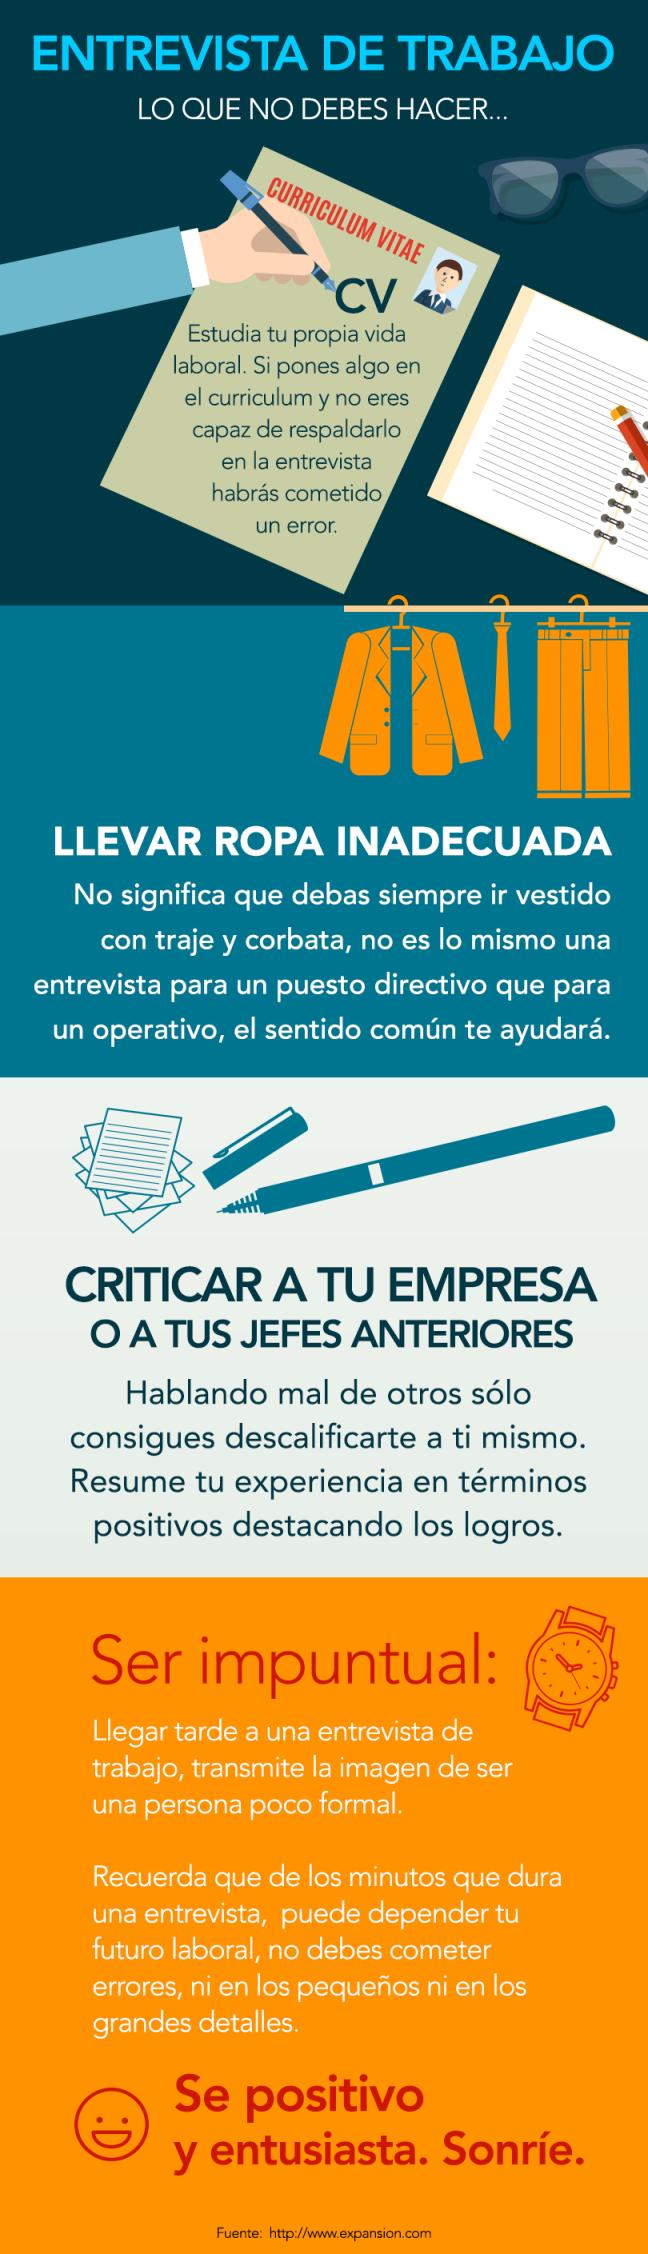 P1010-Infografia_Entrevista_de_trabajo2